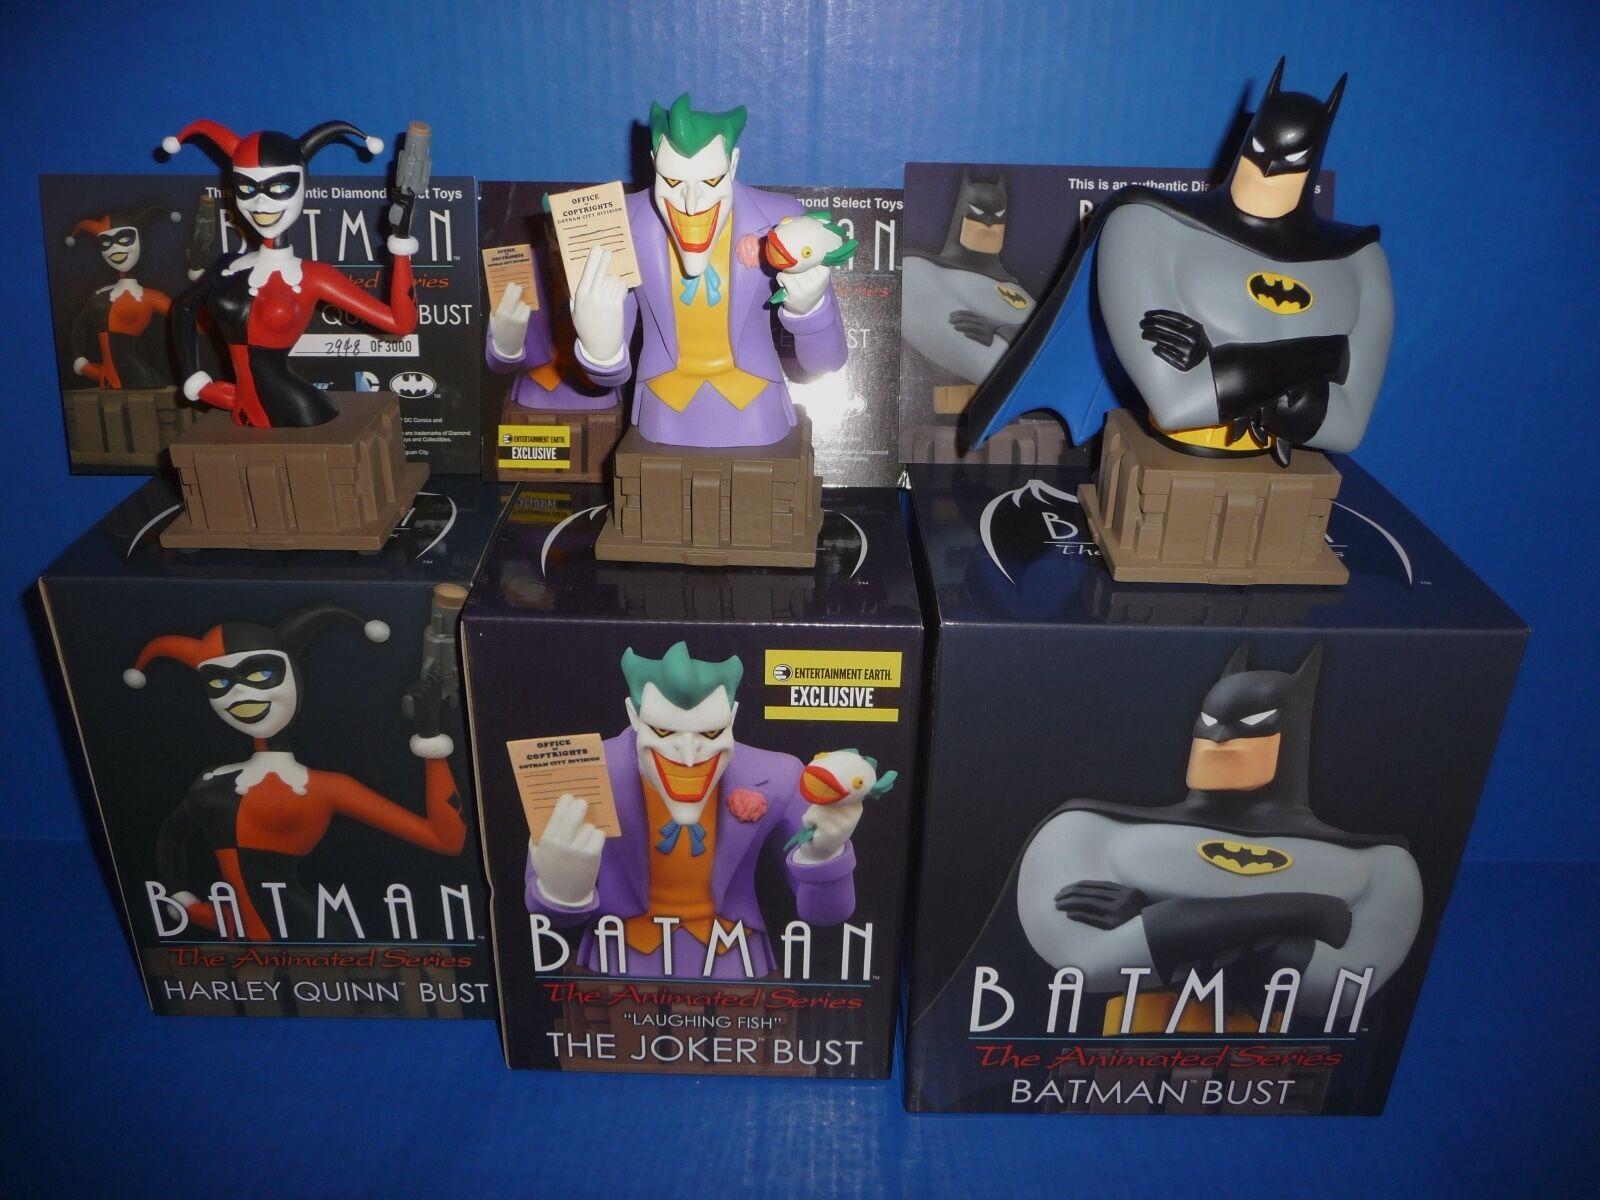 Batman The Animated Serie Busts The Joker, Harley Quinn, Batman Edición Limitada